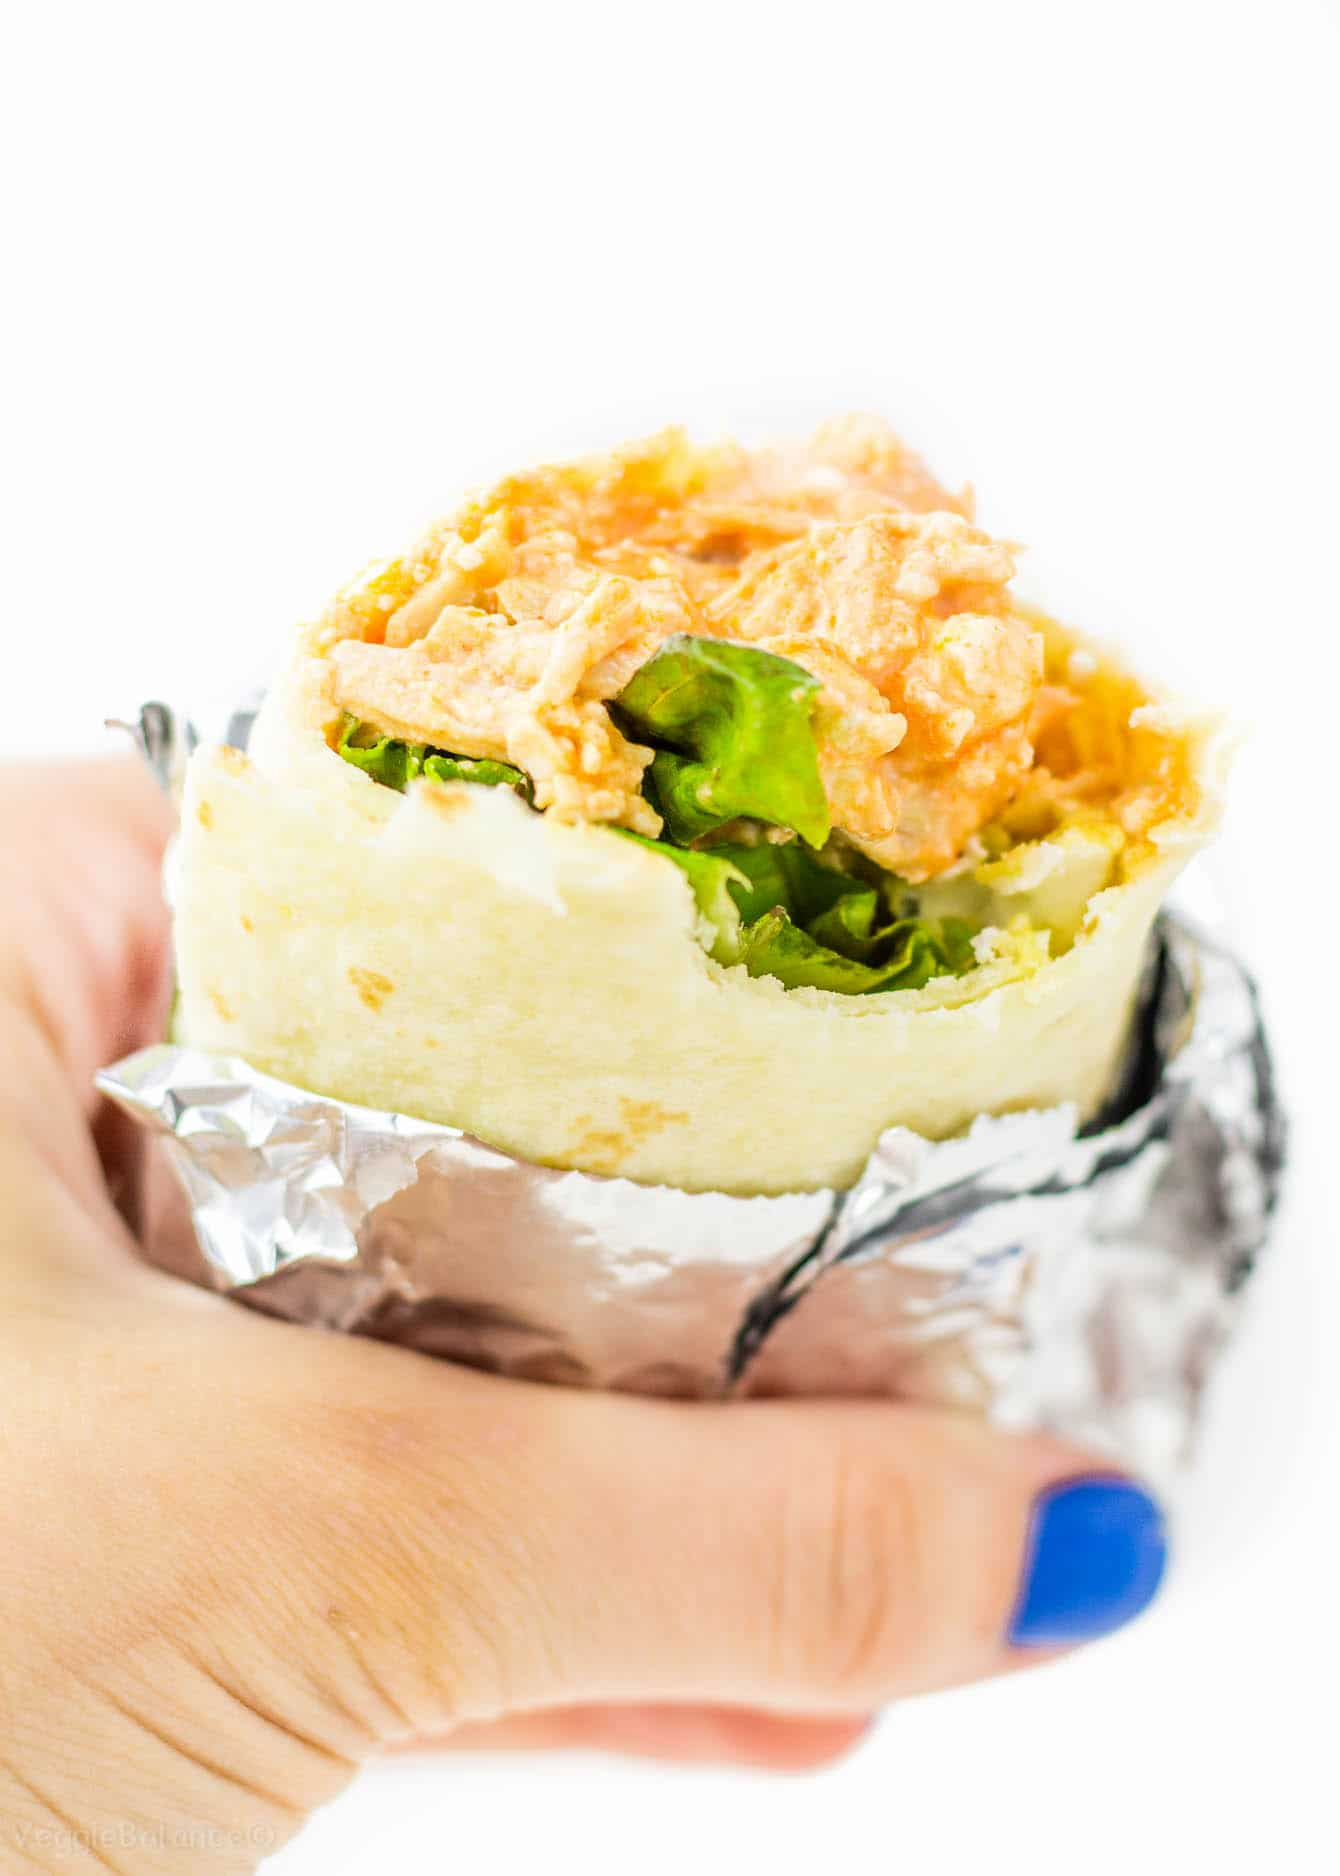 Buffalo Chicken Wraps made with extra hidden protein Gluten free - Veggiebalance.com